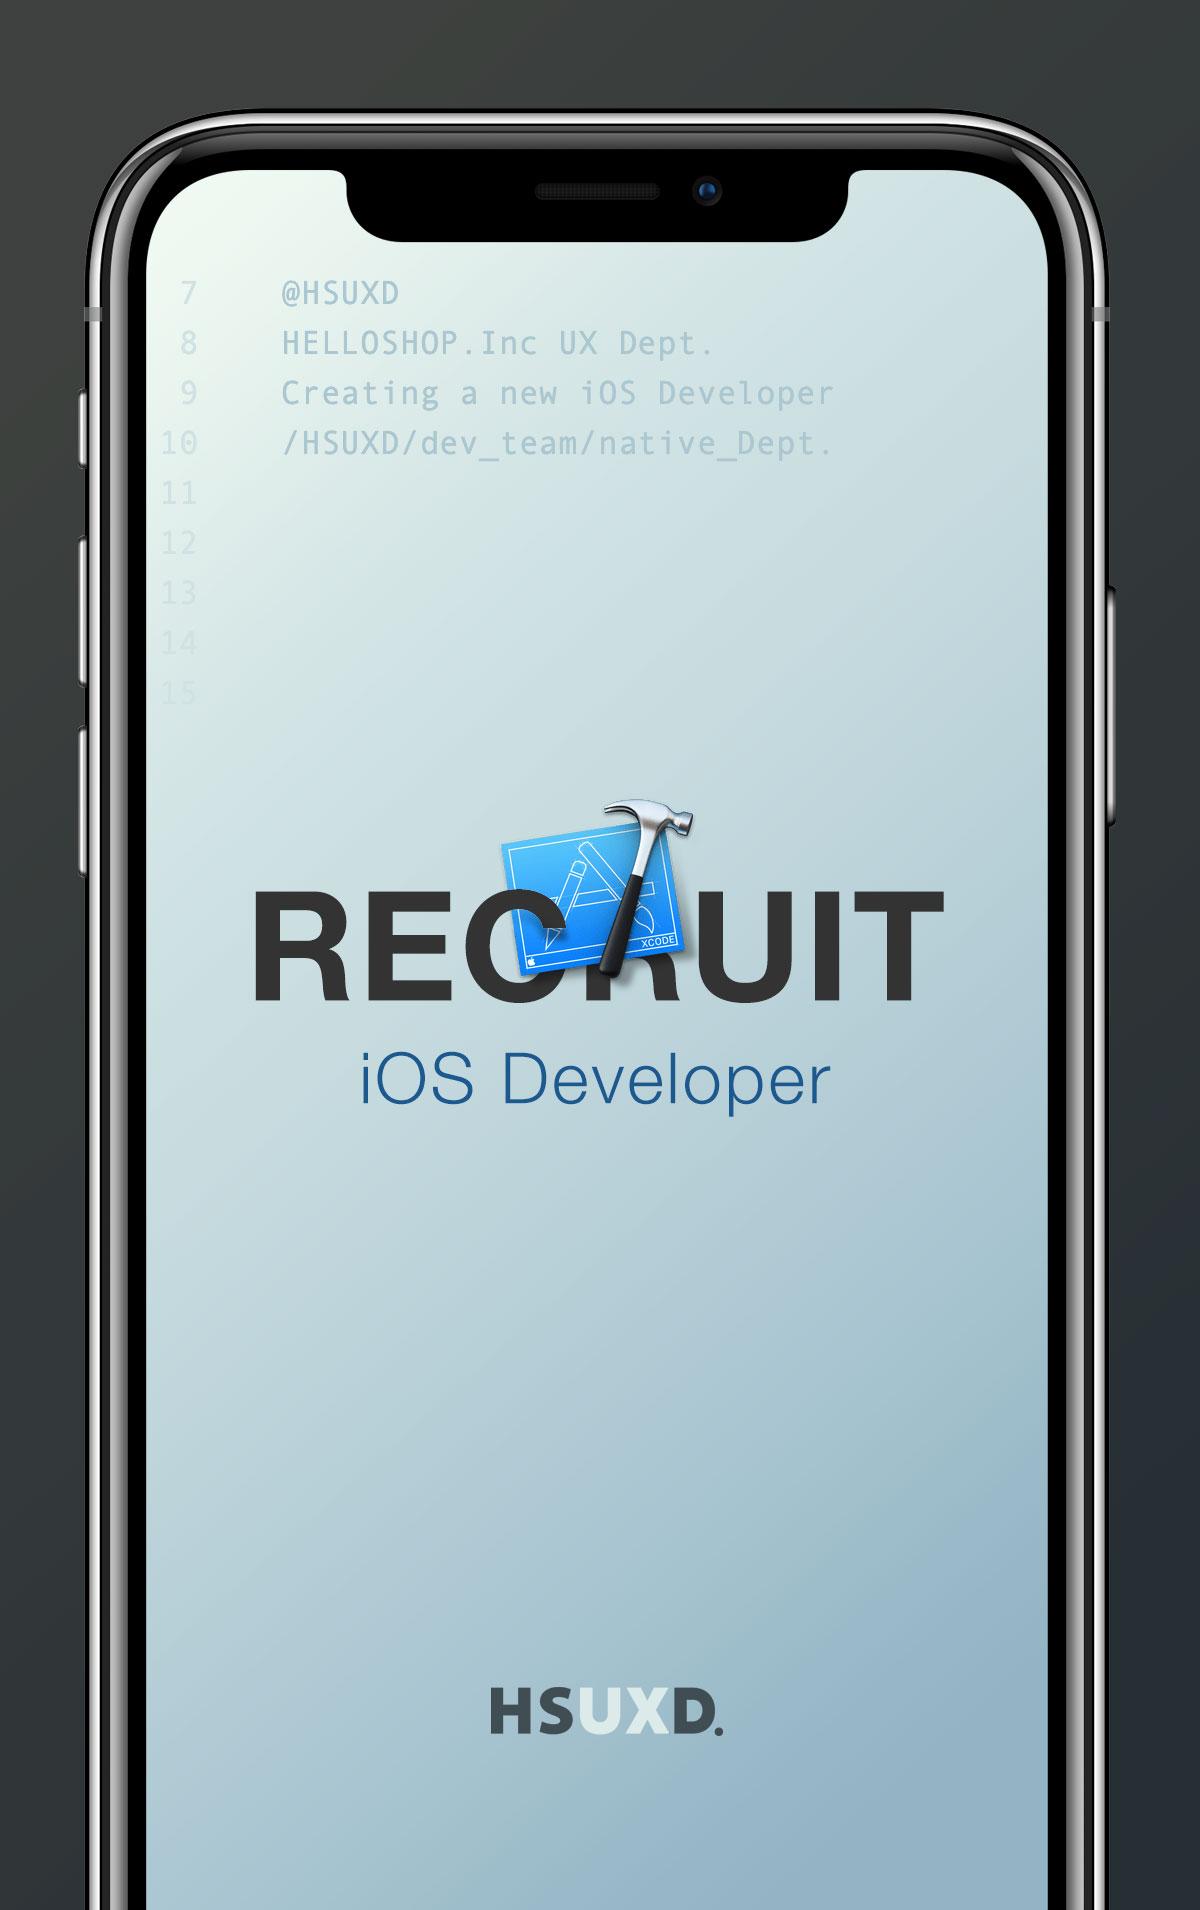 HSUXD - iOS 개발자 채용 - JOB